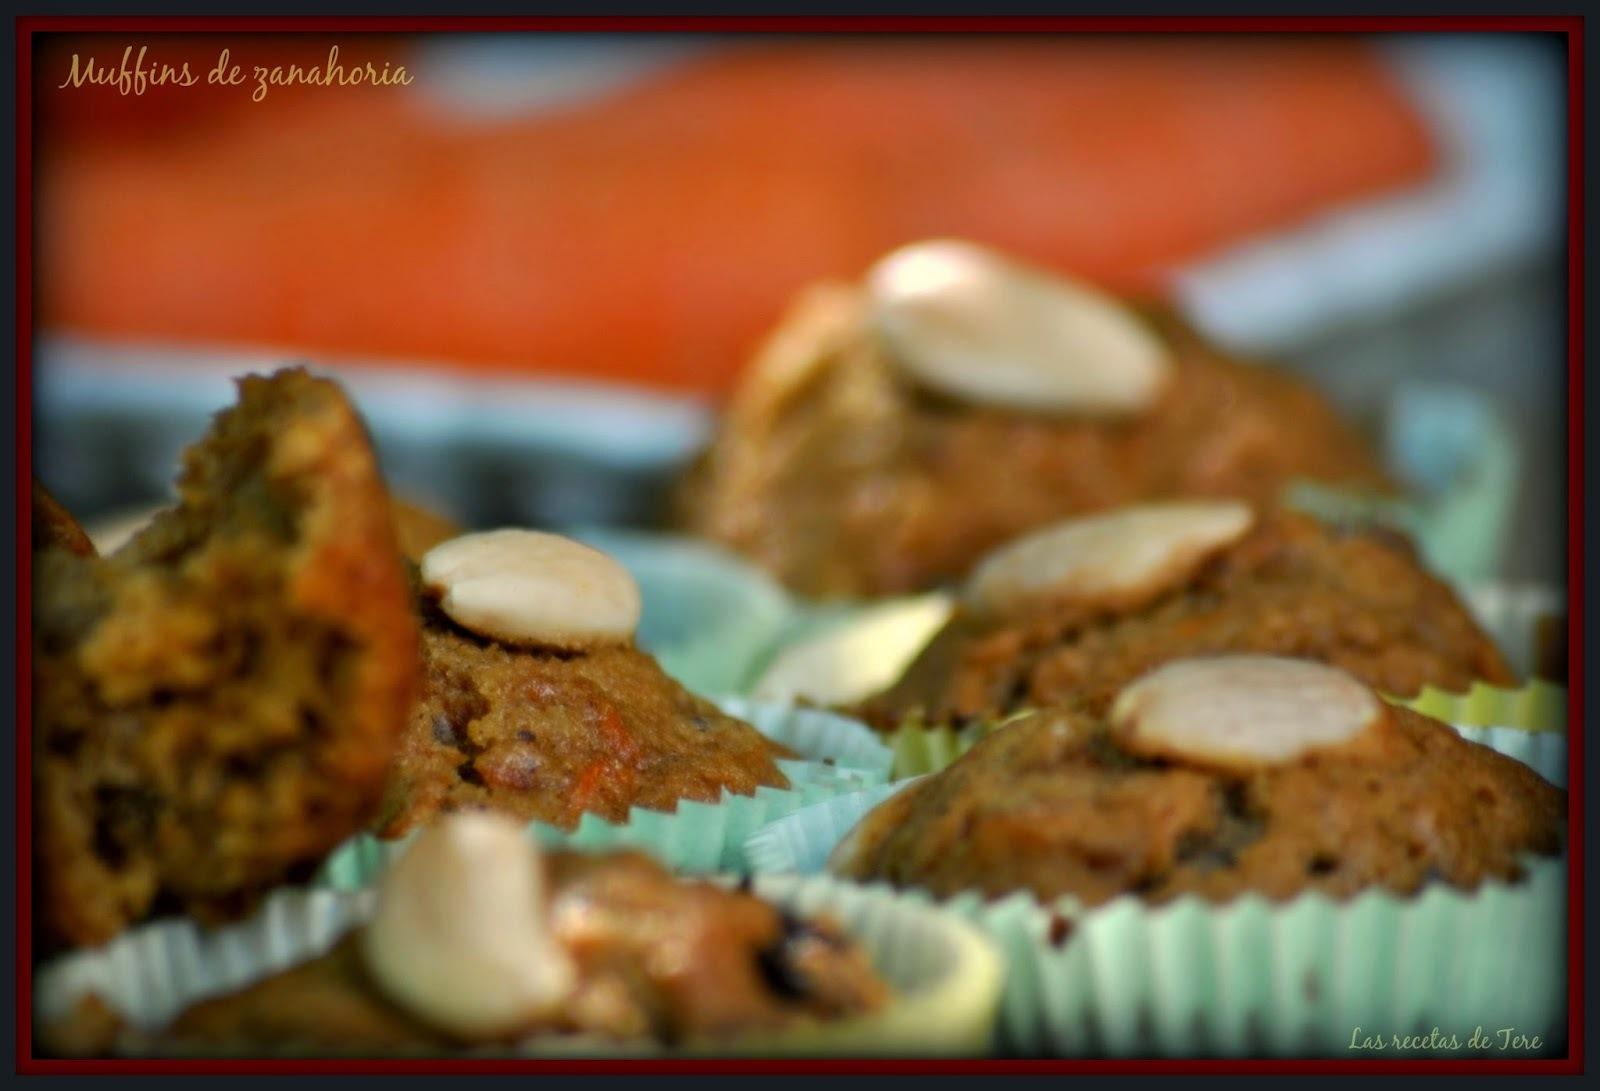 Muffins de zanahoria.